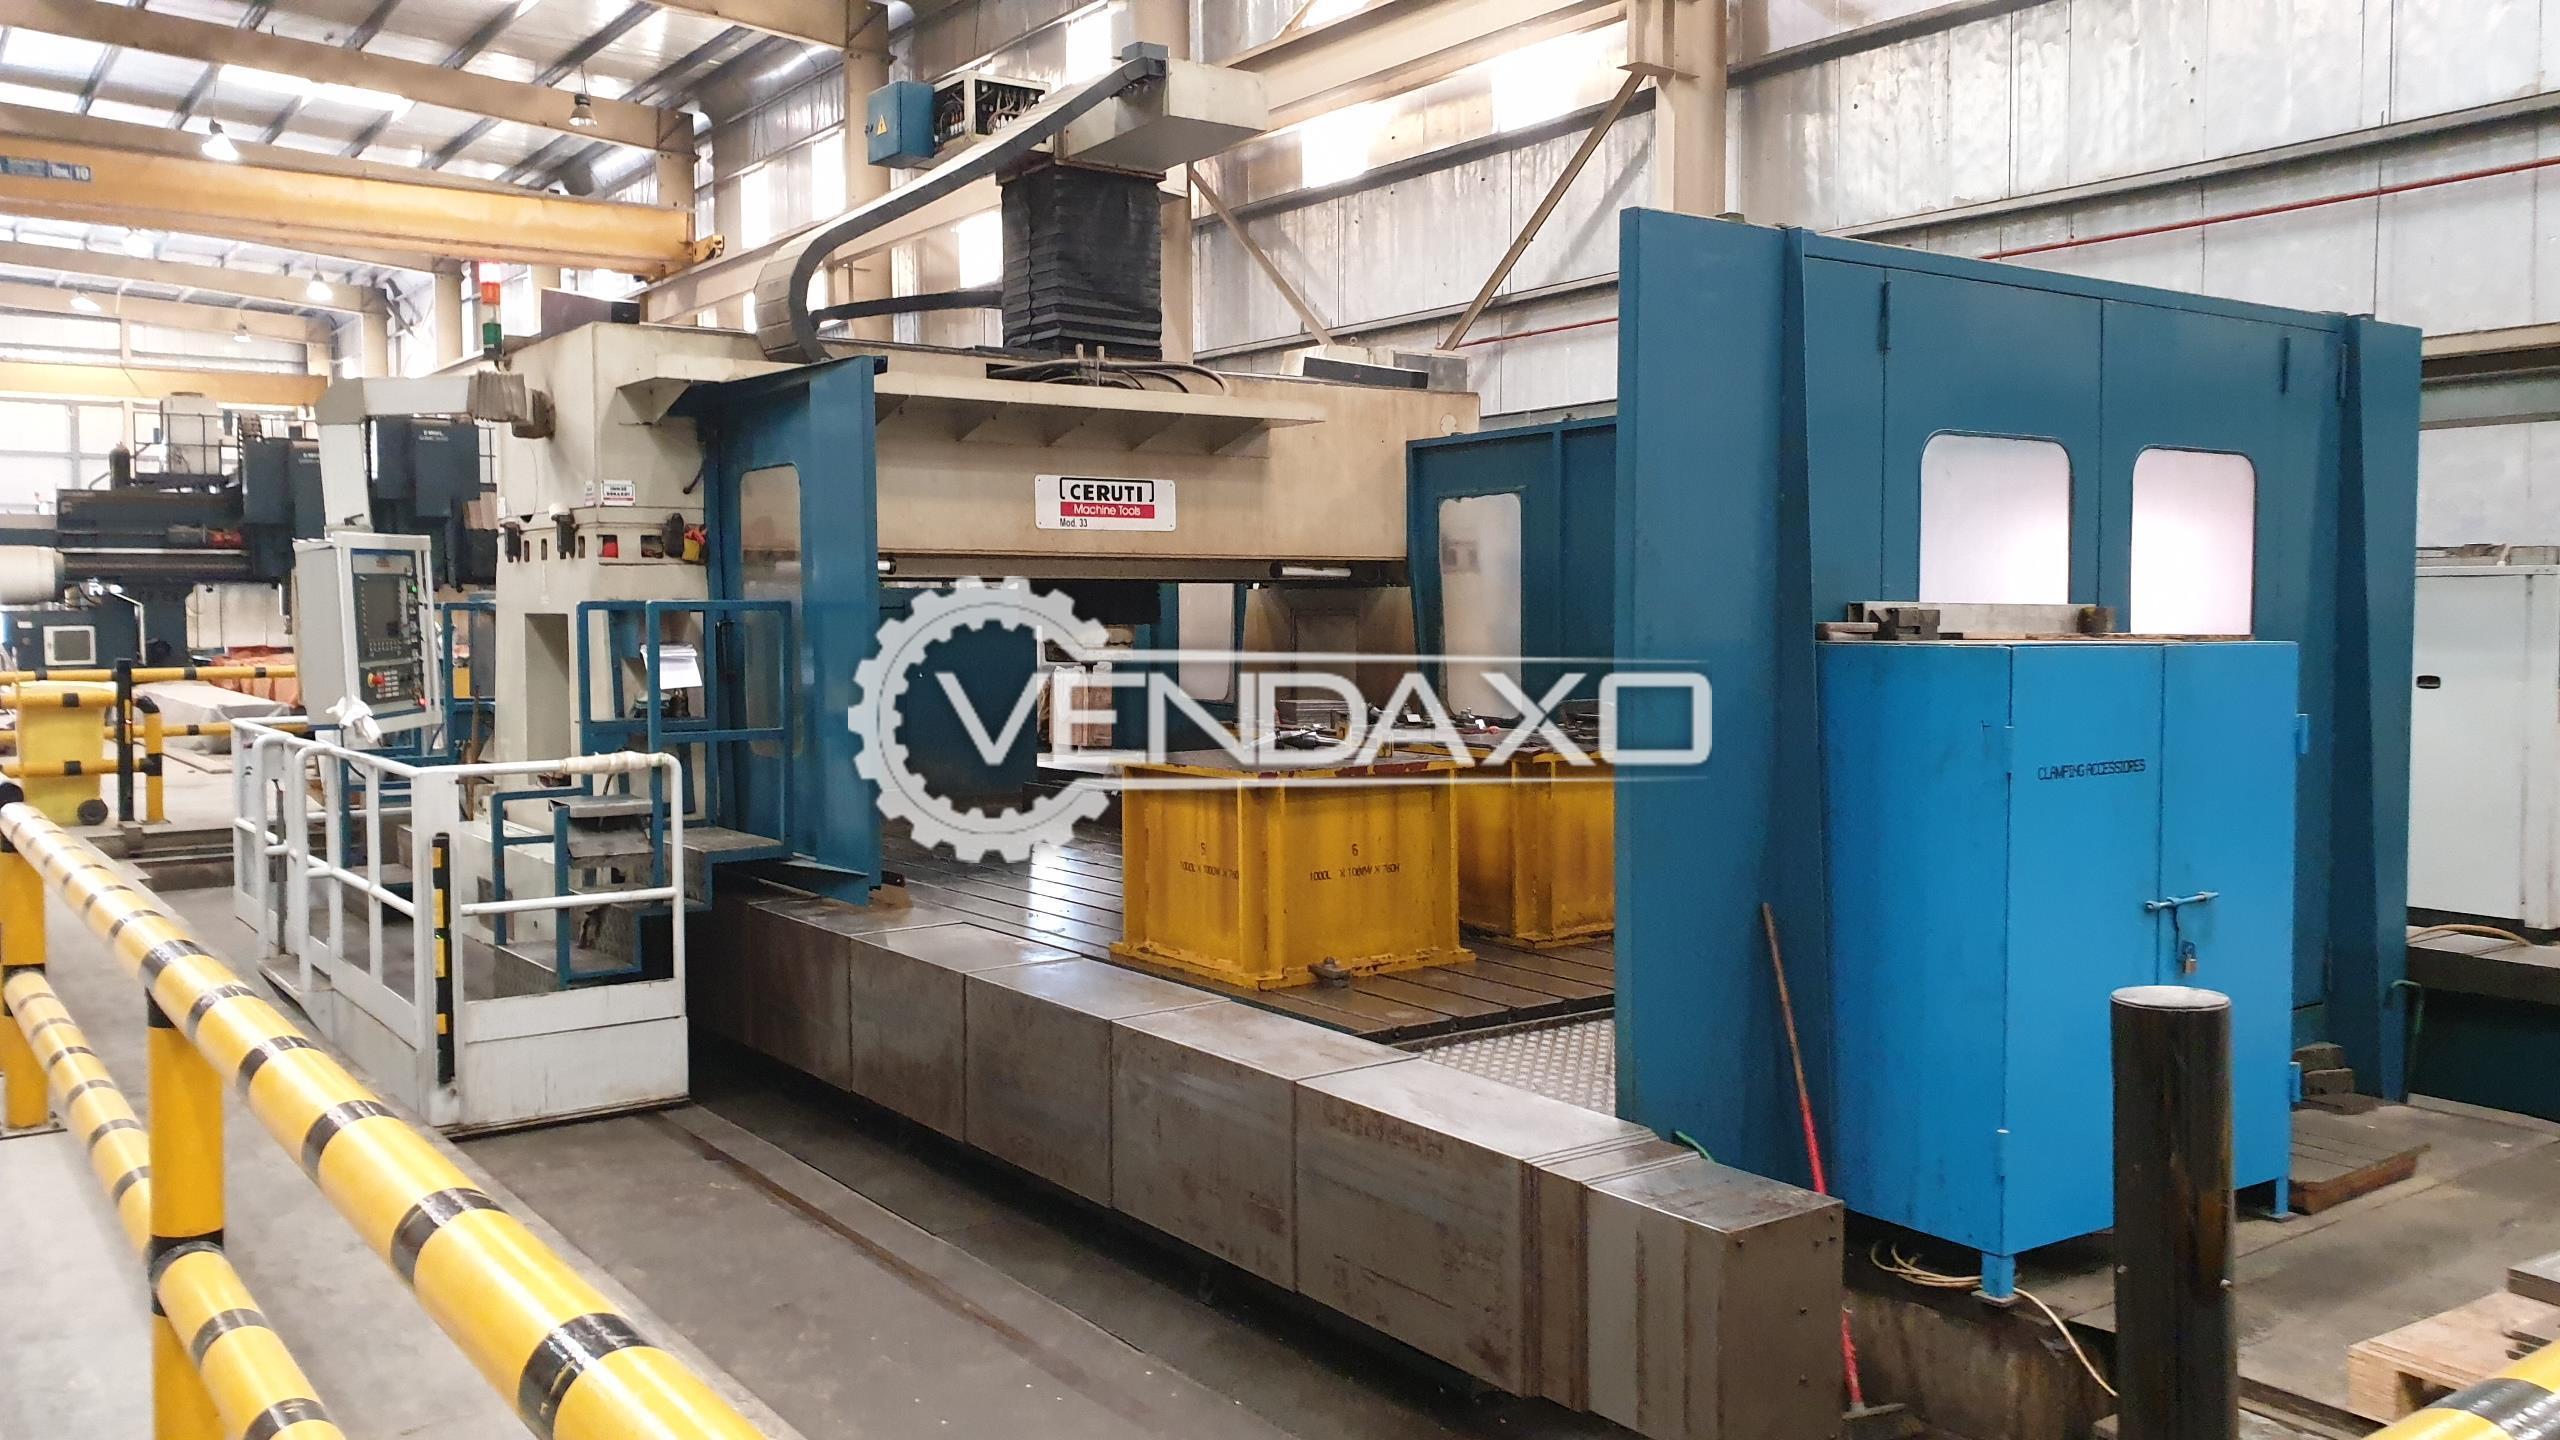 Innse Berardi Ceruti 33-8000 CNC Gantry Type Milling Machine - Table Size : 8000 x 3000 mm